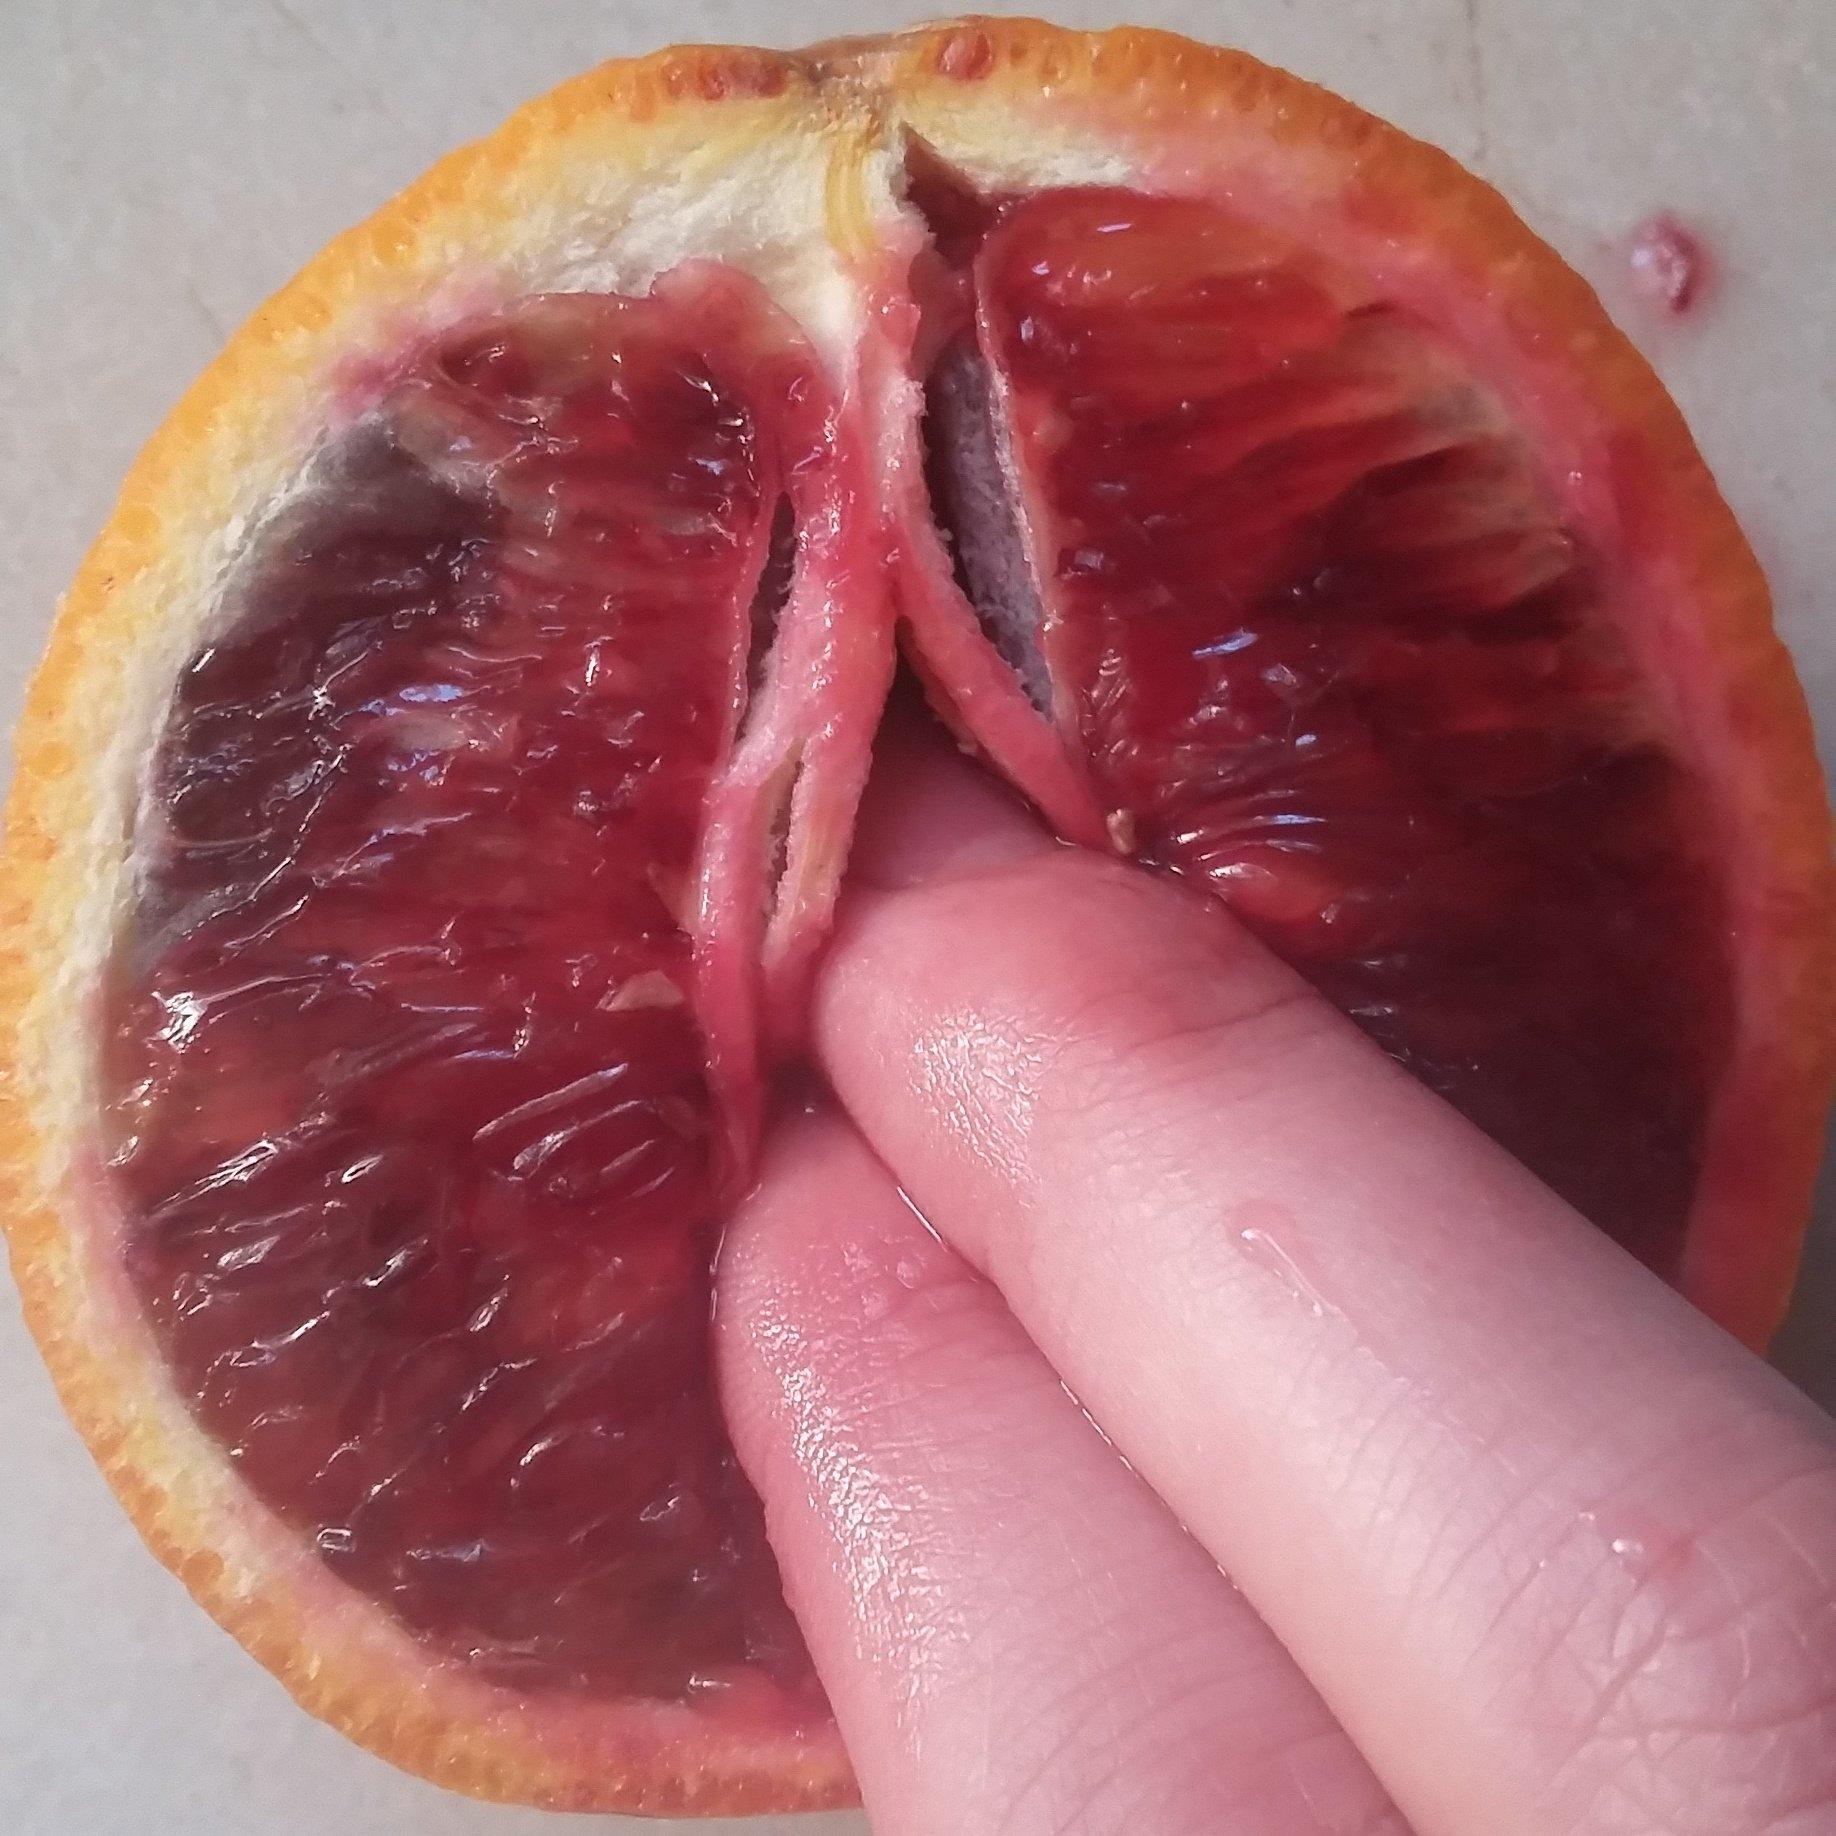 Fruit of the vulva